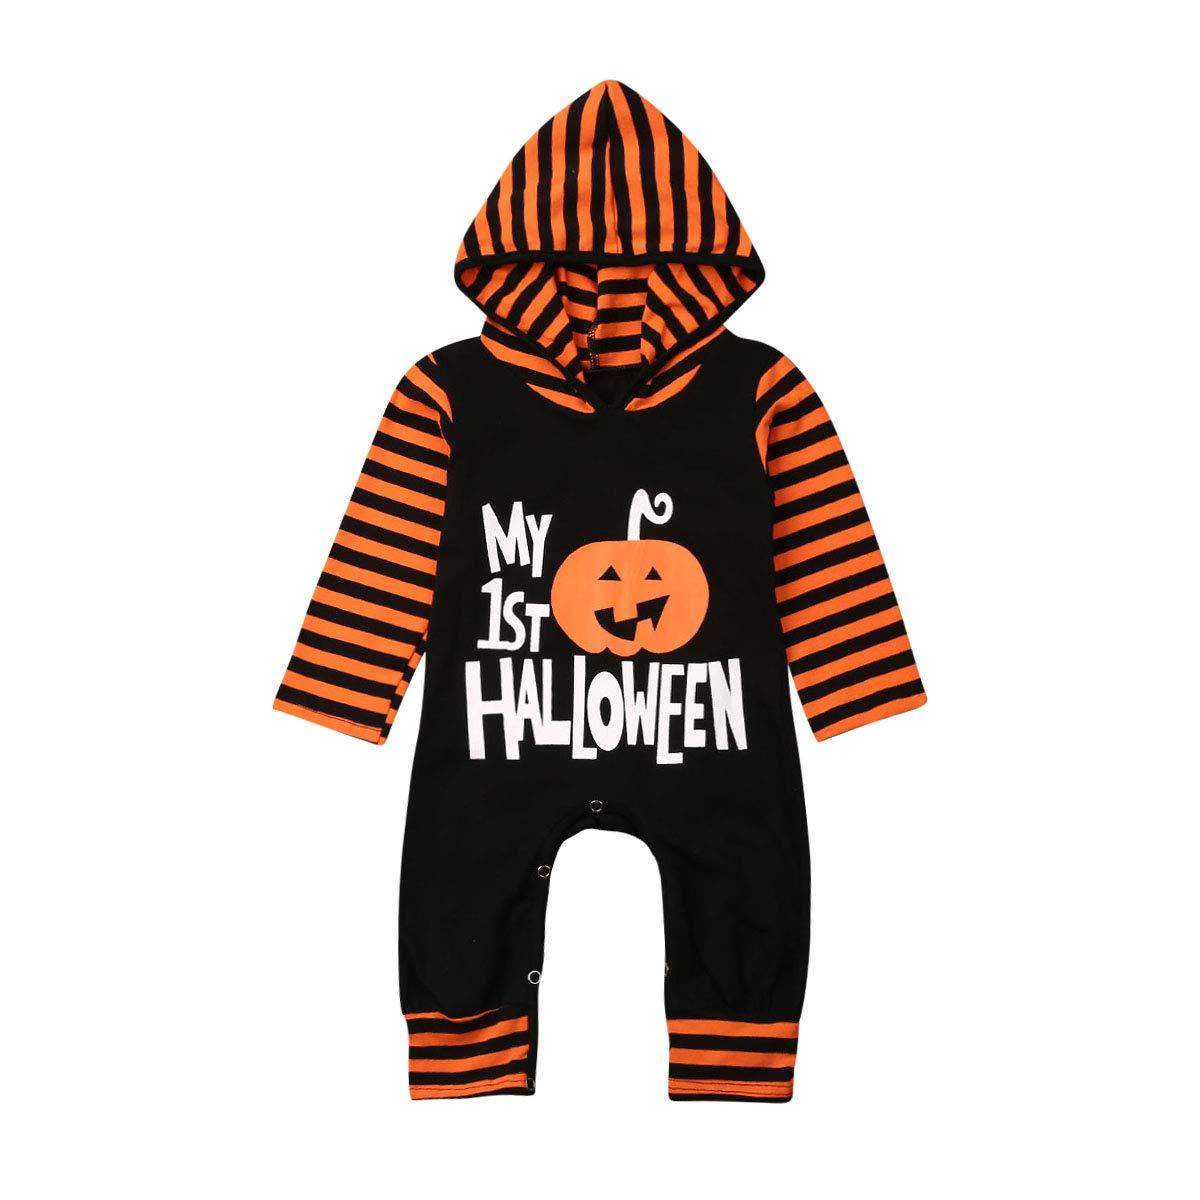 para Halloween y ni/ños de 0 a 18 Meses WANGSGOGO Mono de Manga Larga con Capucha para beb/és y ni/ñas